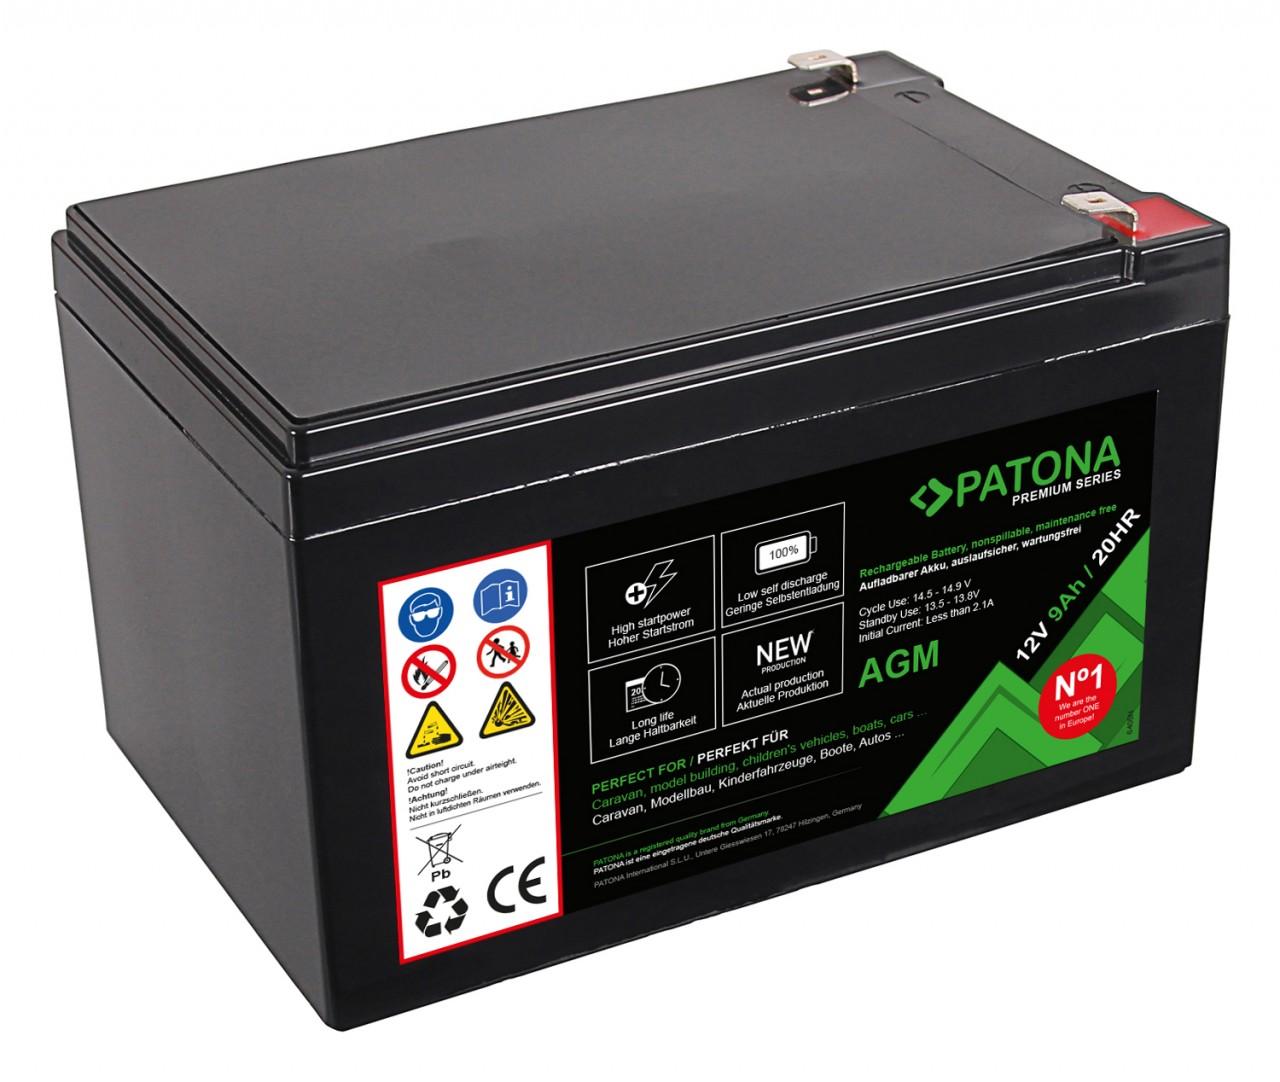 PATONA Premium AGM Lead Battery 12V 12Ah 20HR